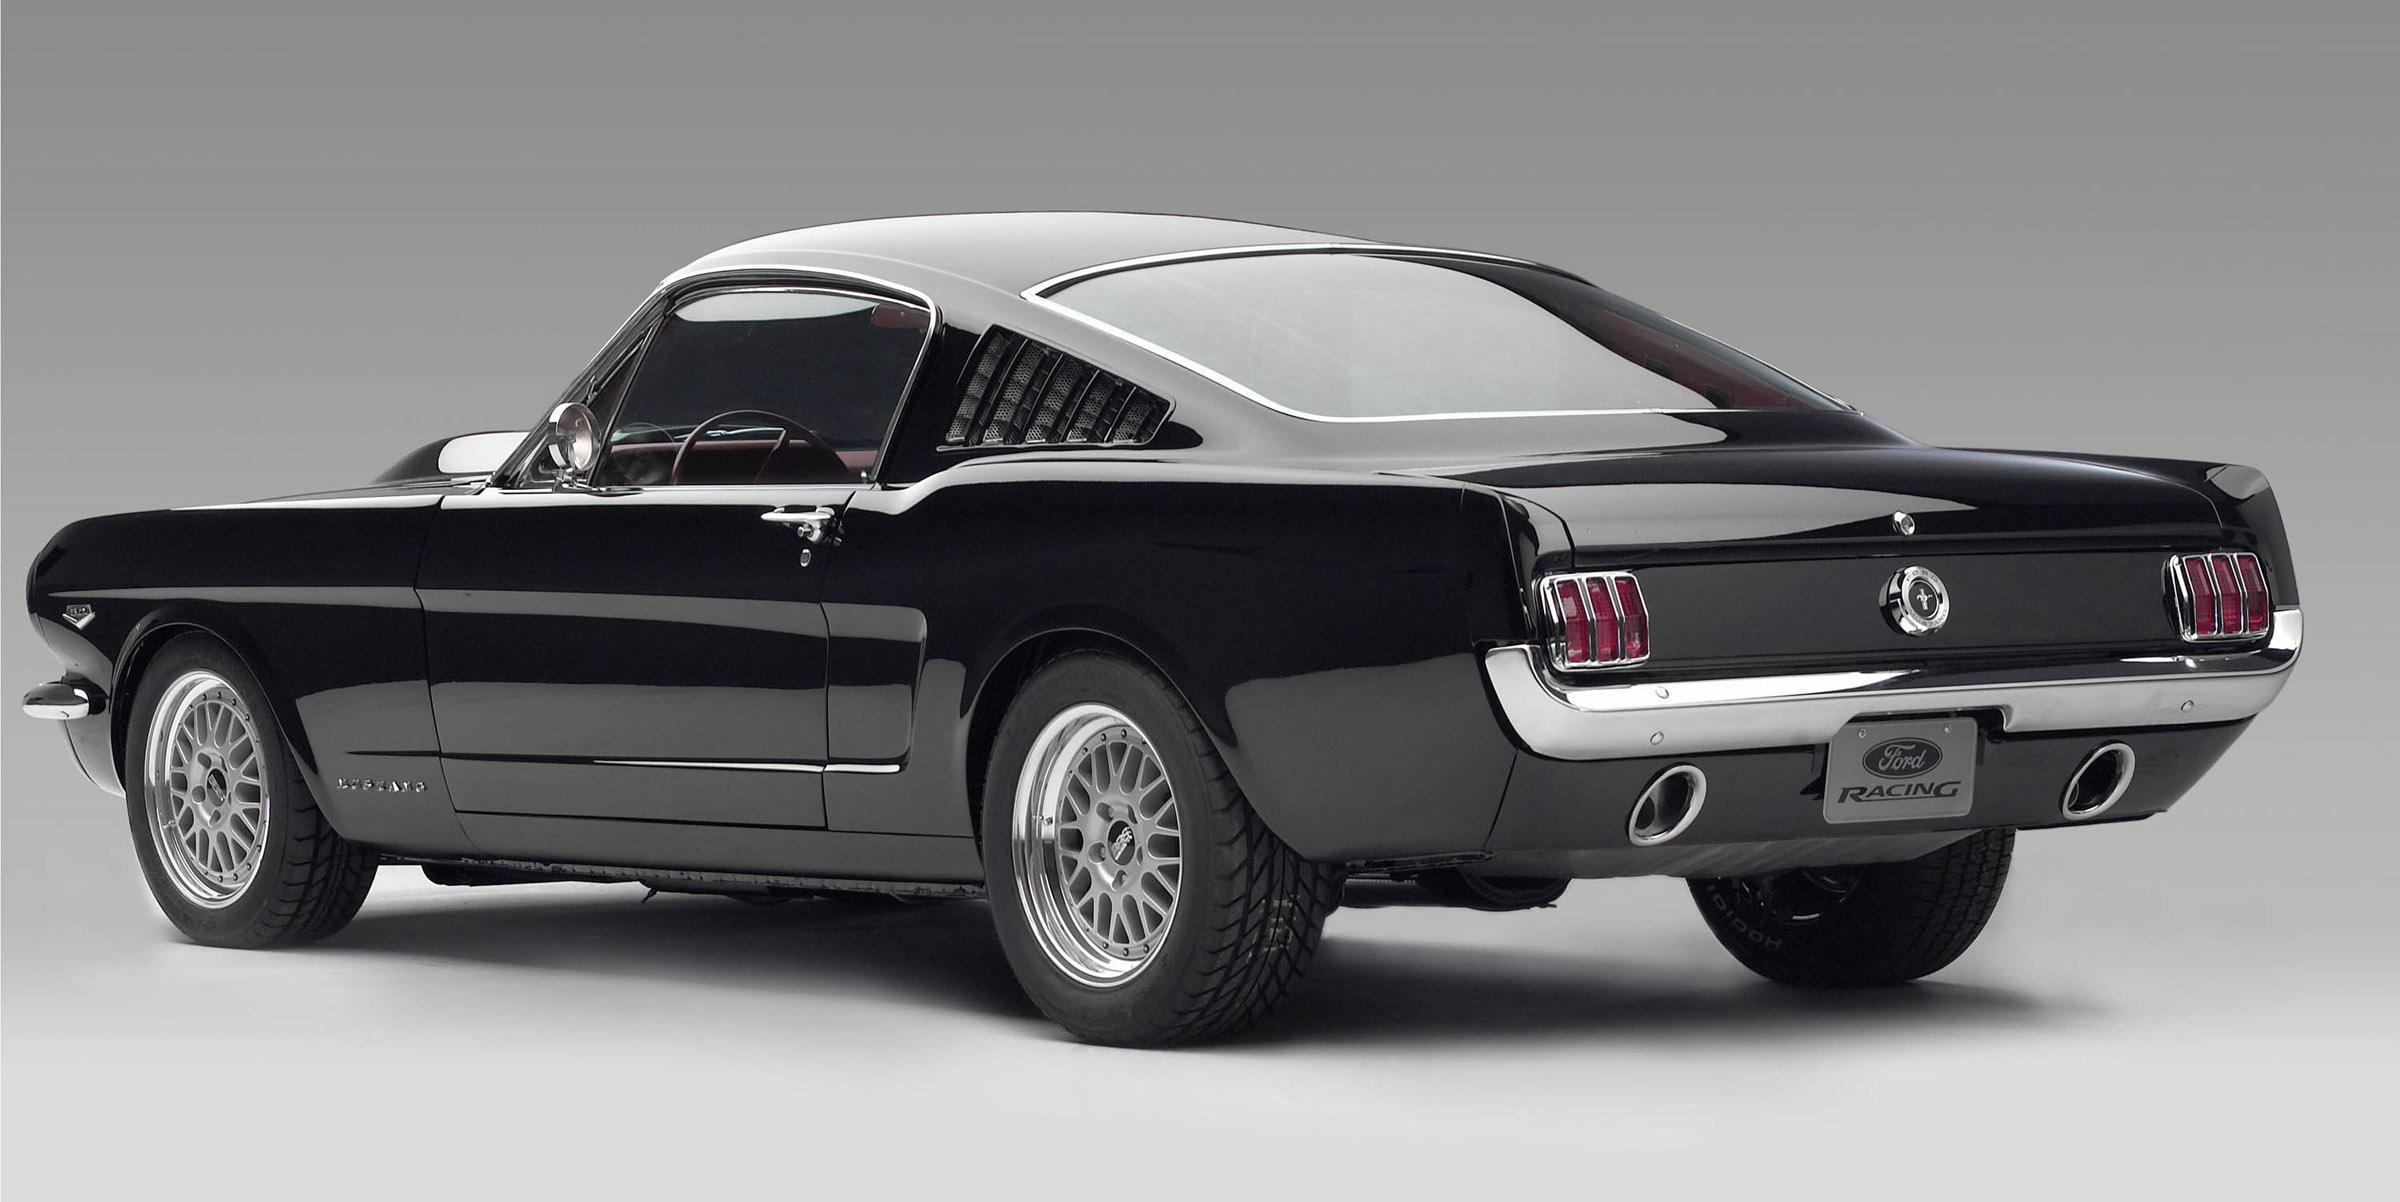 2012 Ford Mustang Convertible Reviews